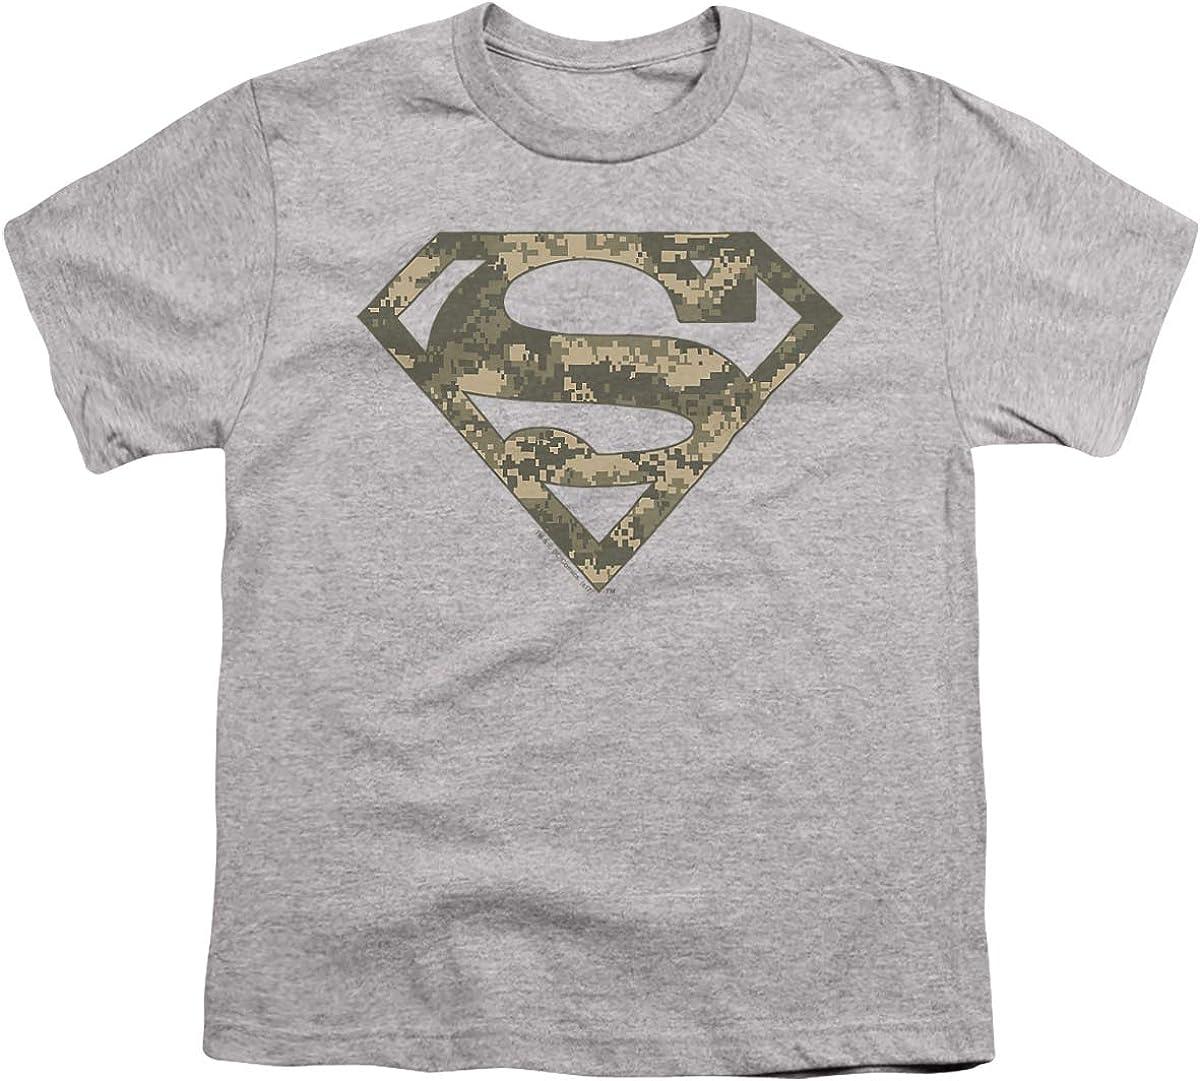 Superman Army Camo Shield Unisex Youth T Shirt, Athletic Heather, Large